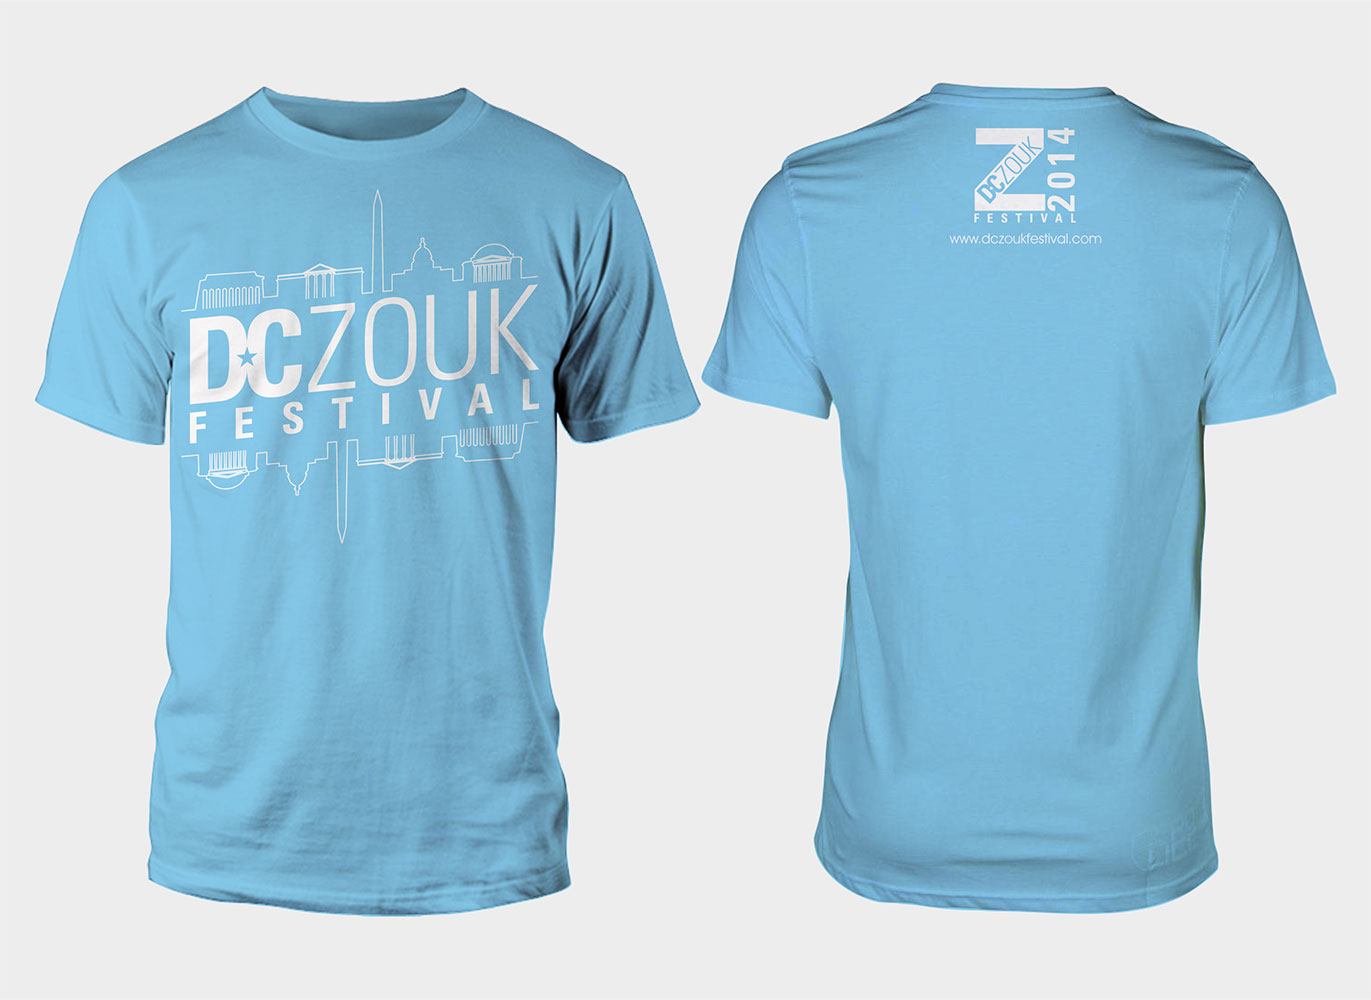 Festival t shirt design for dczoukfestival by 777sky for T shirt design festival